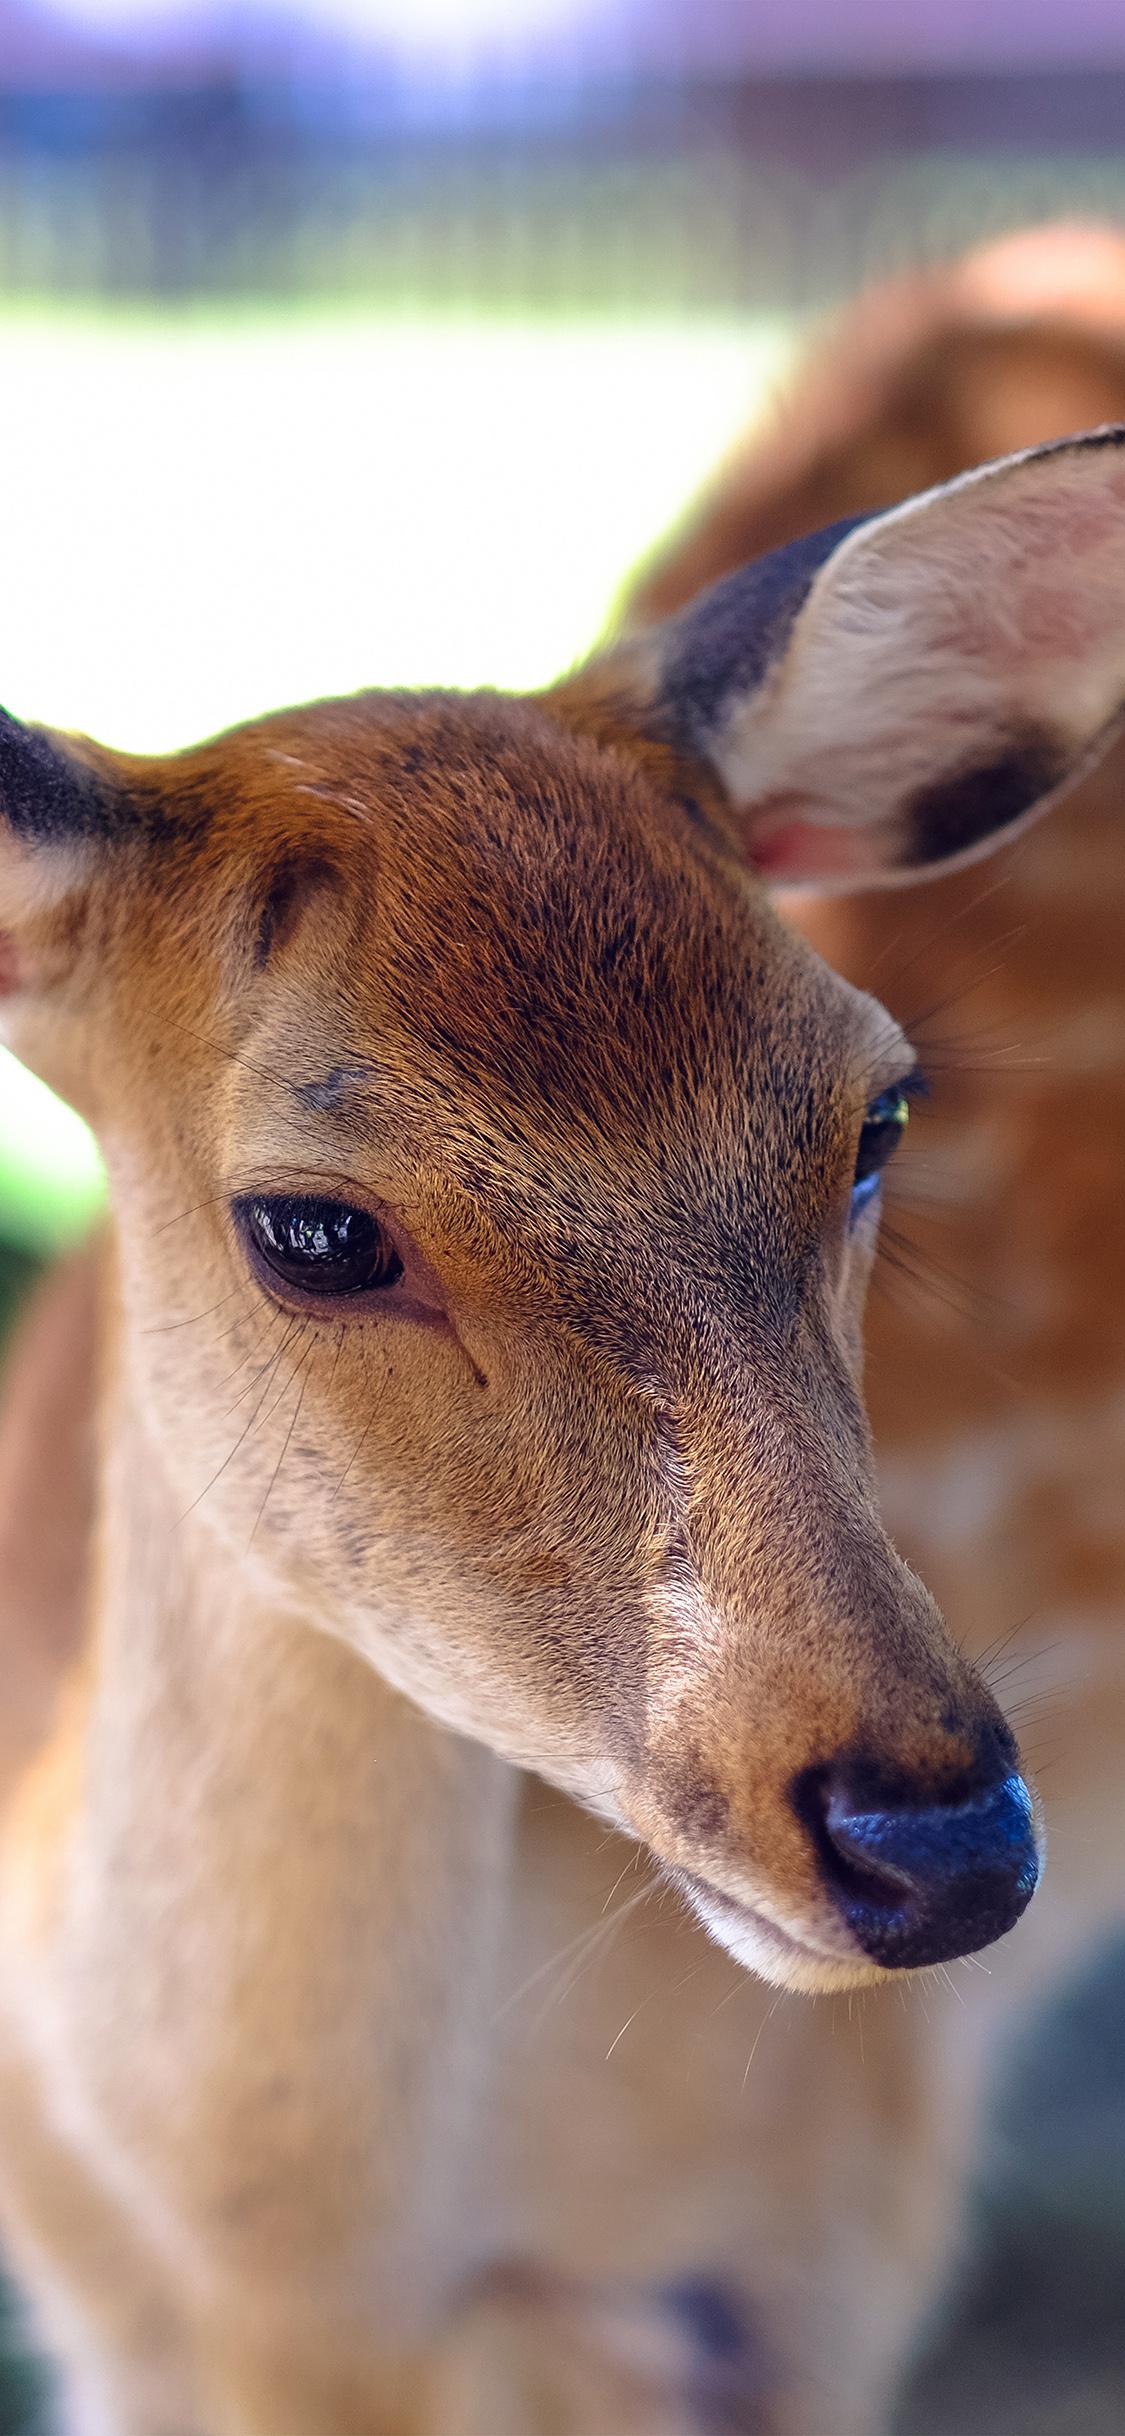 iPhoneXpapers.com-Apple-iPhone-wallpaper-ne38-deer-cute-animal-soft-nature